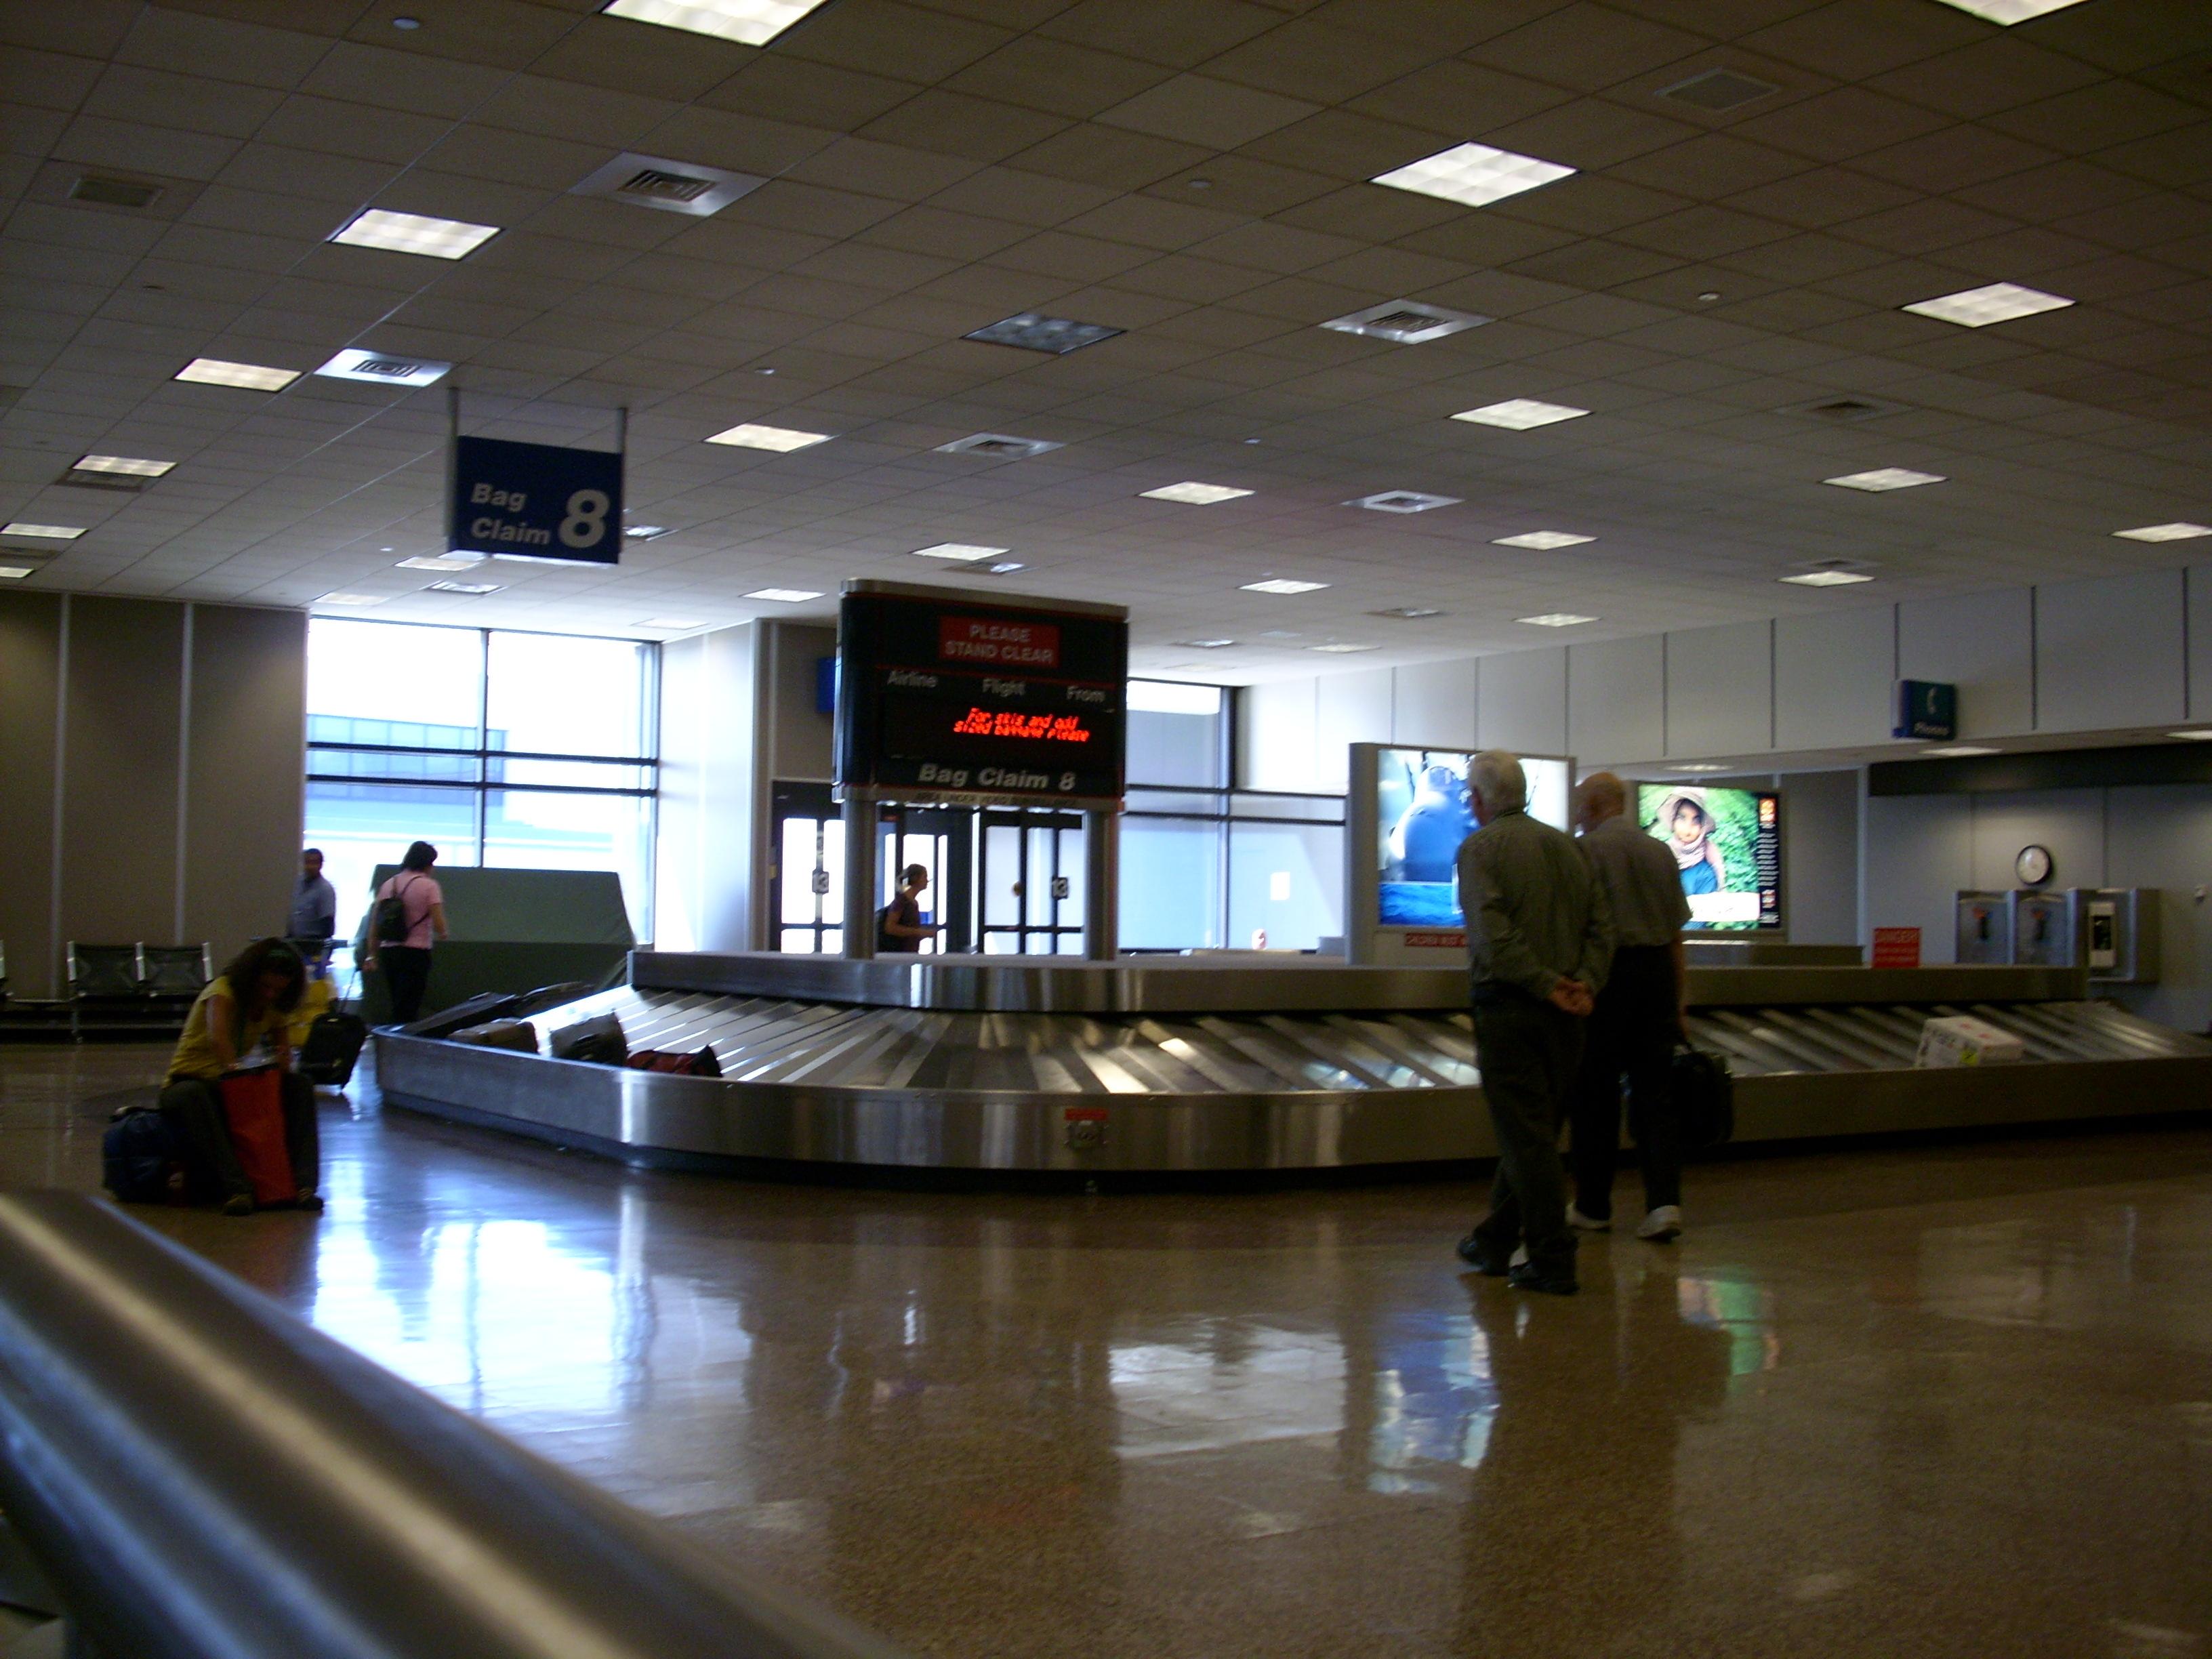 Файлslc airport baggage claimjpg � Википедия